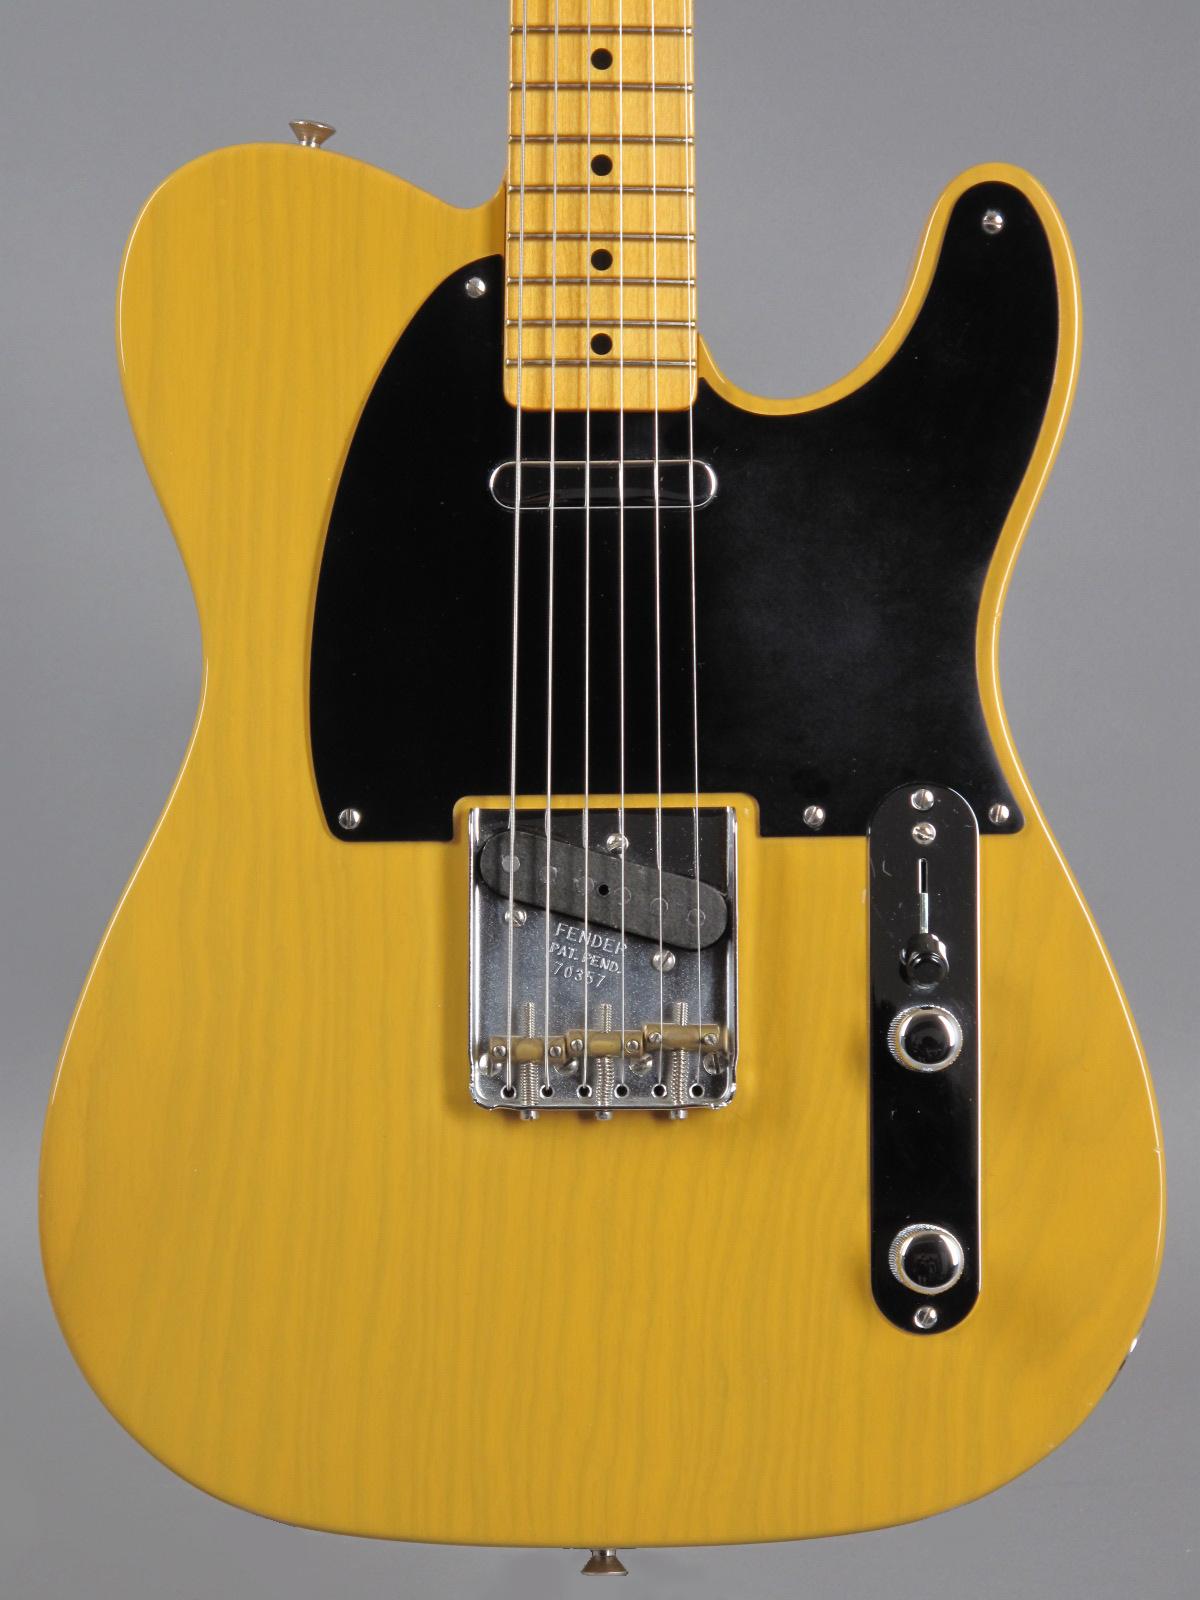 2011 Fender American Vintage 1952 Telecaster Reissue - Butterscotch Blond